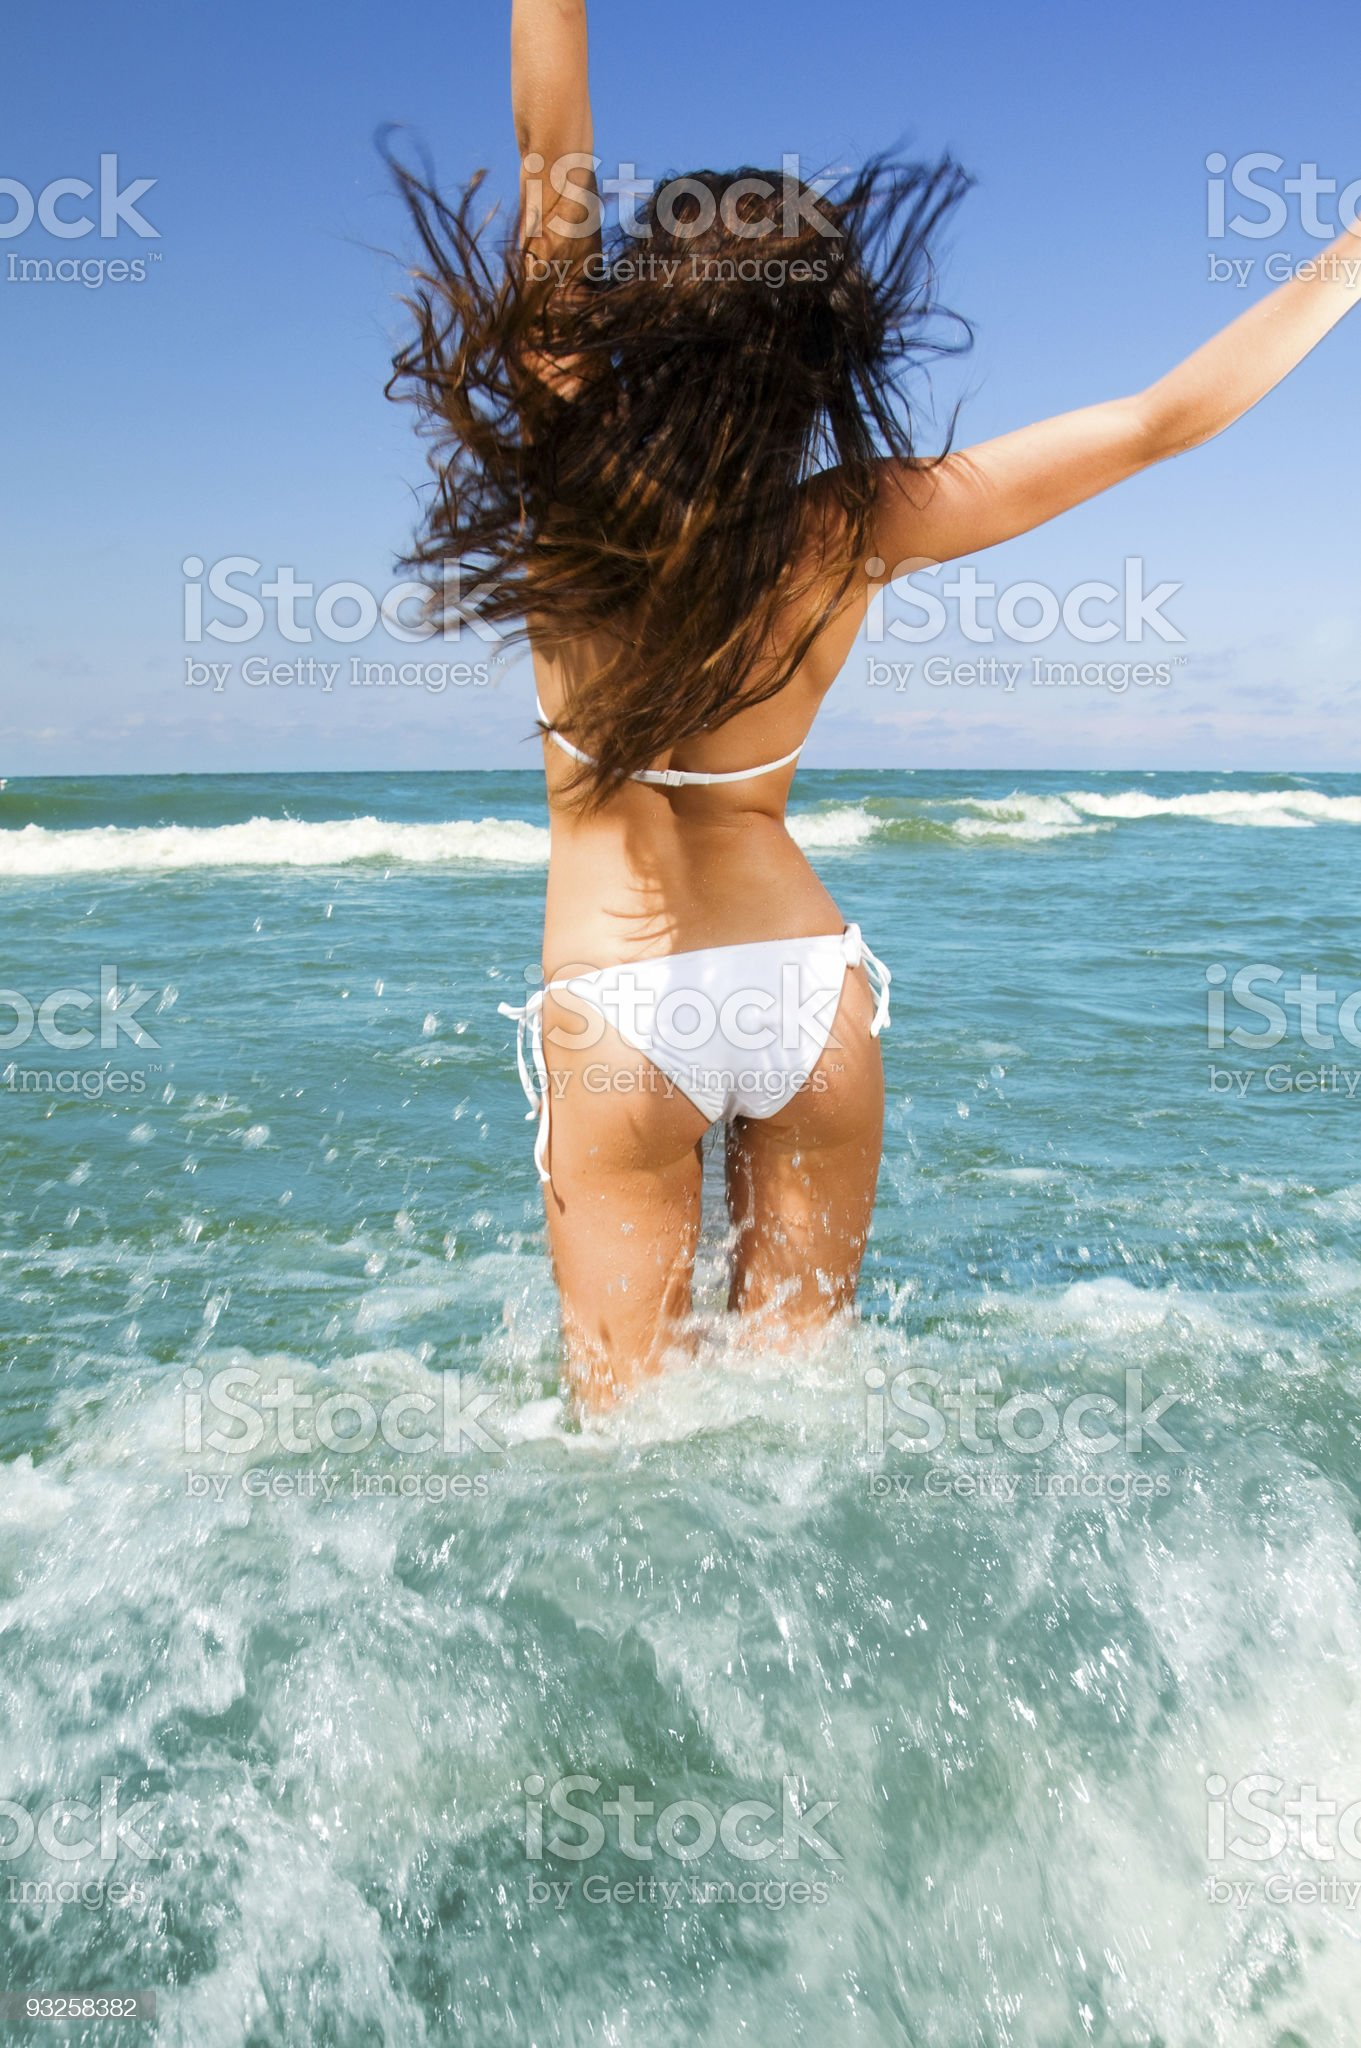 Summertime Beach Fun royalty-free stock photo